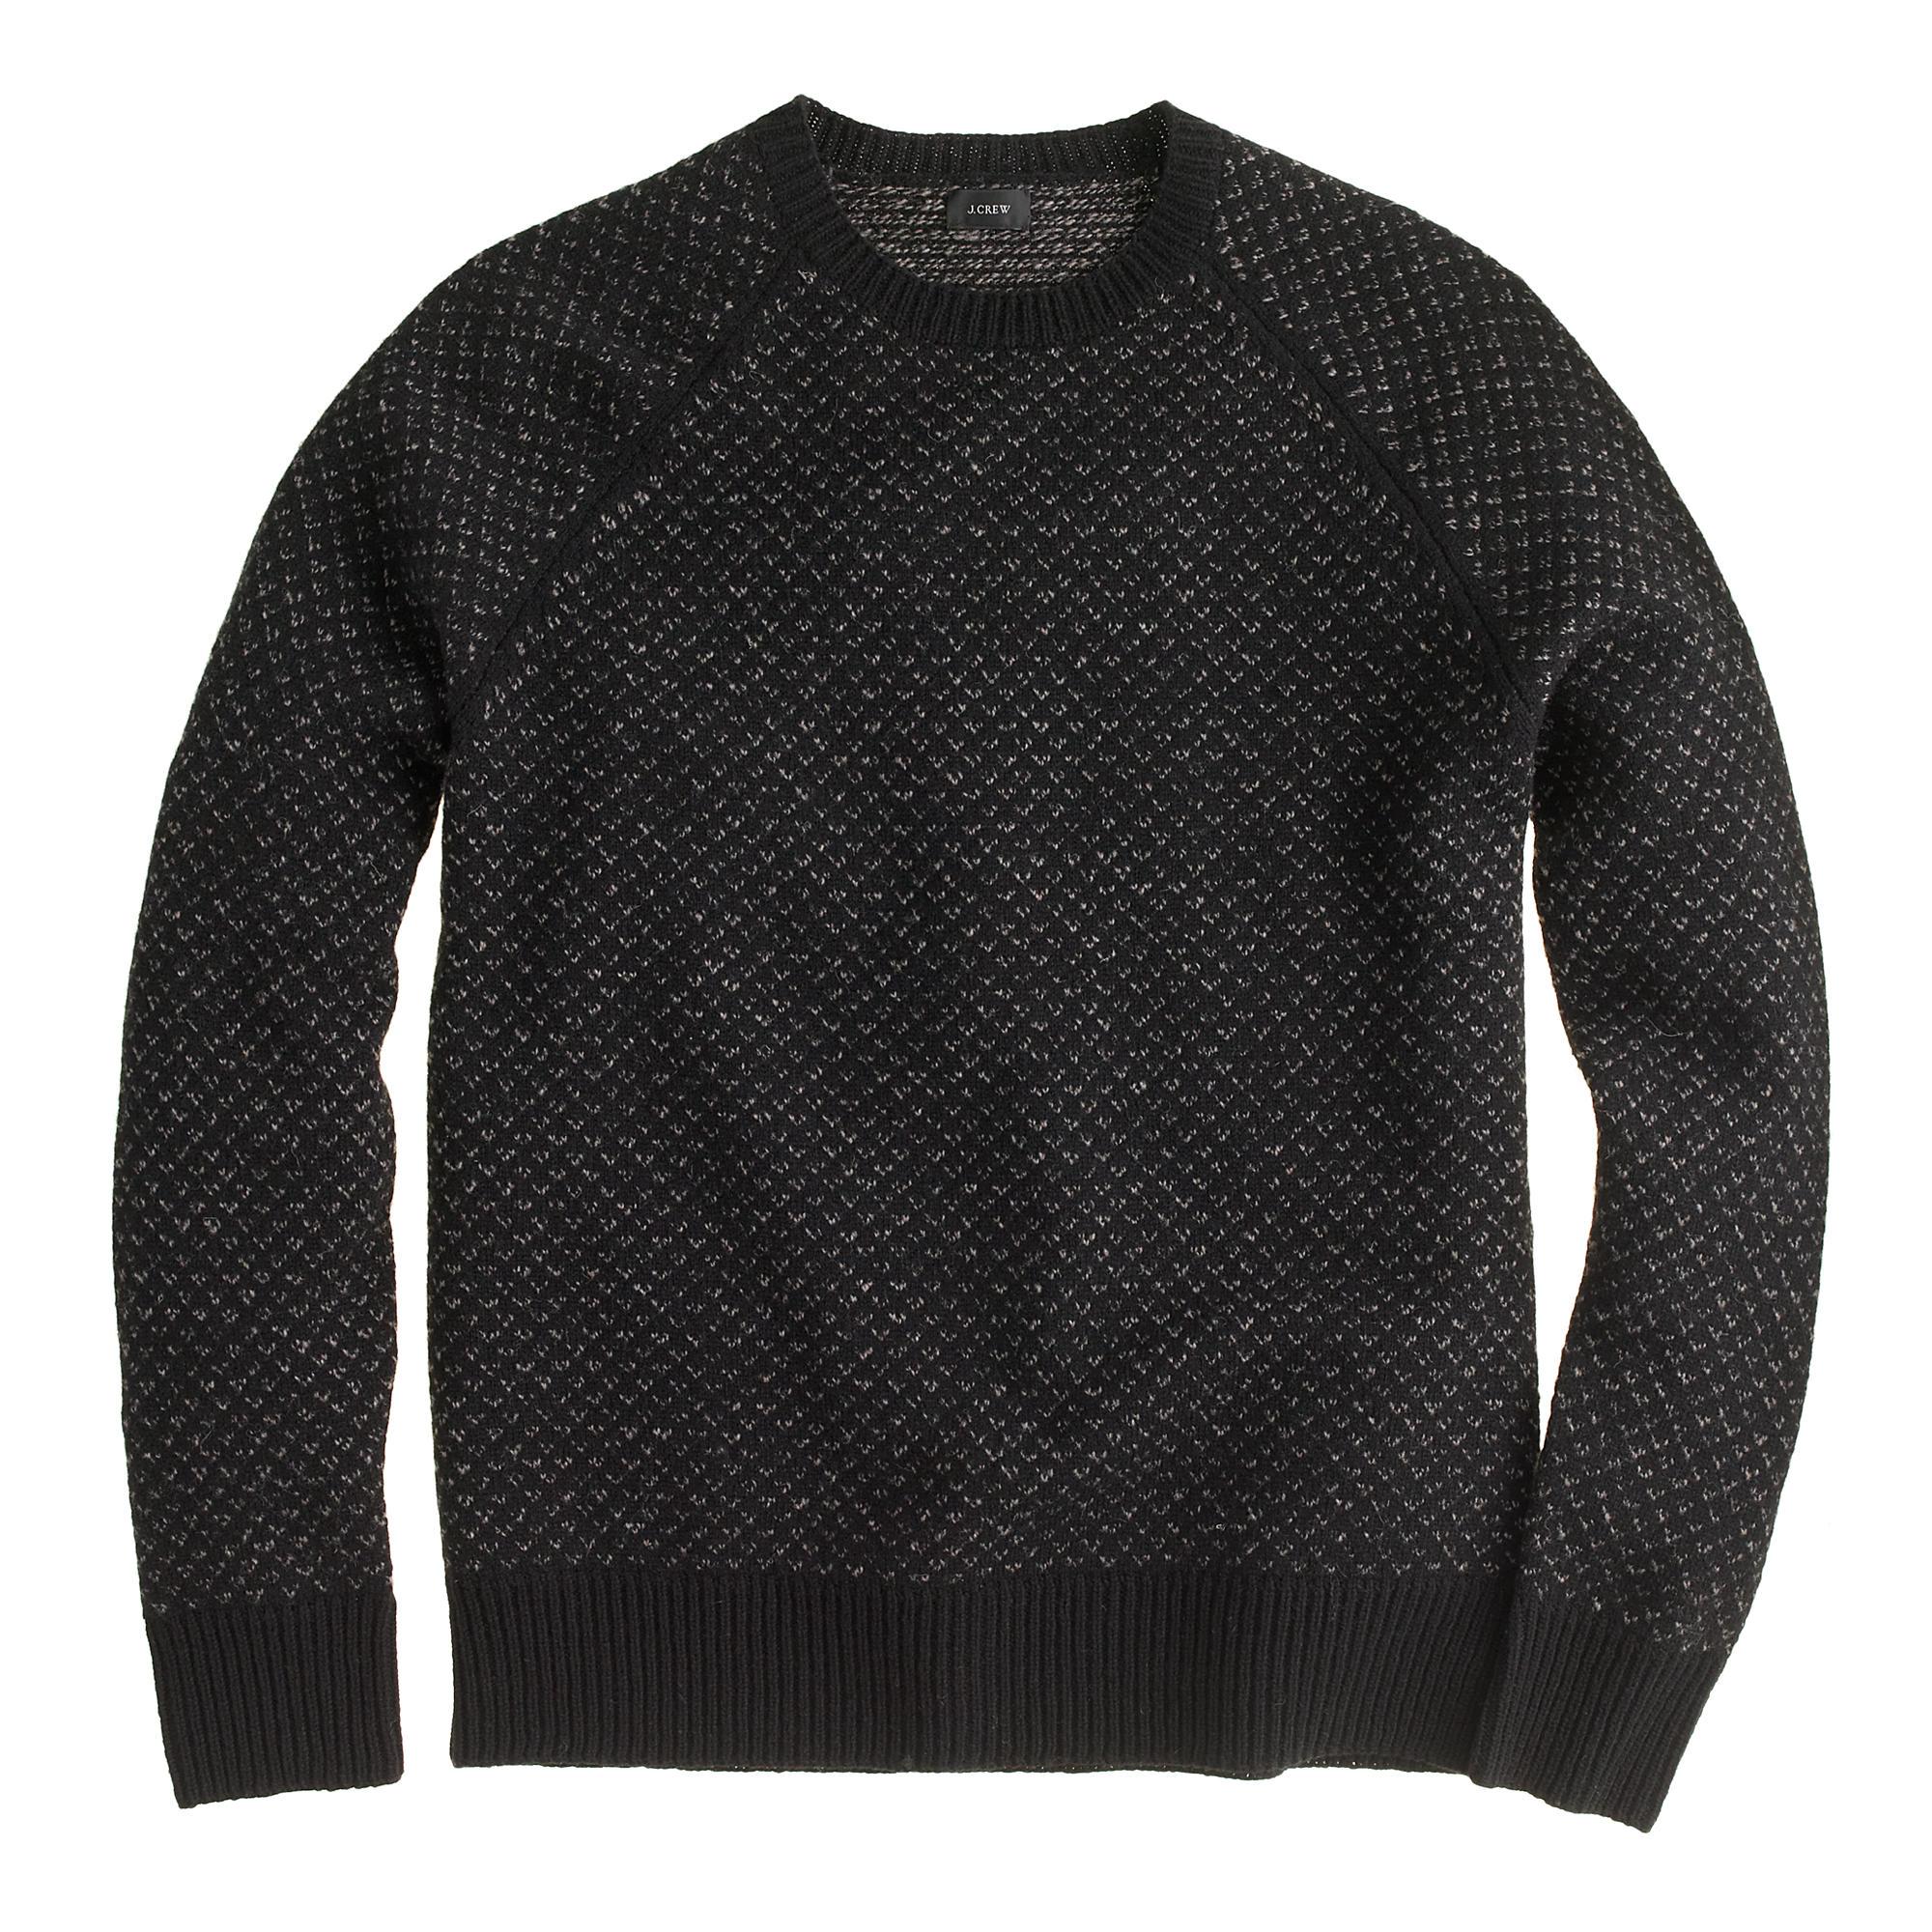 J.Crew Lambswool Bird's-Eye Sweater | 10 Fall Wardrobe Essentials for Men